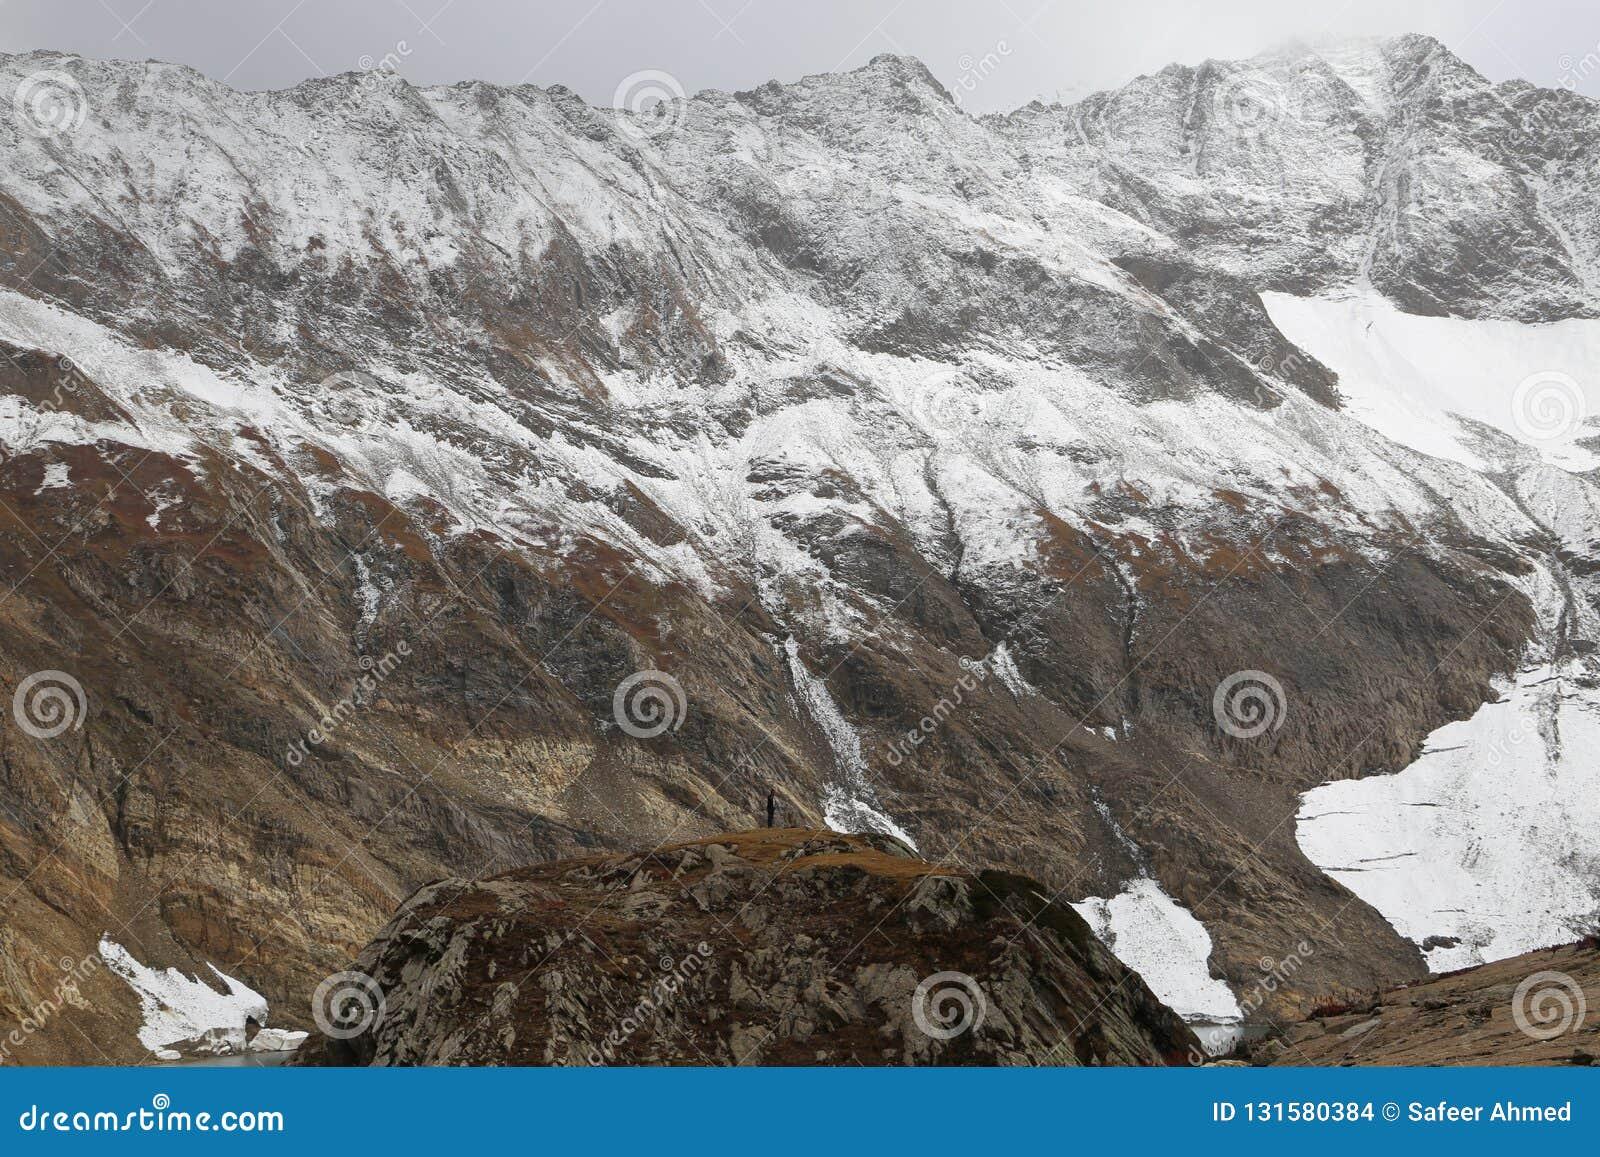 Vista de la montaña montañosa nevosa debajo de las nubes oscuras